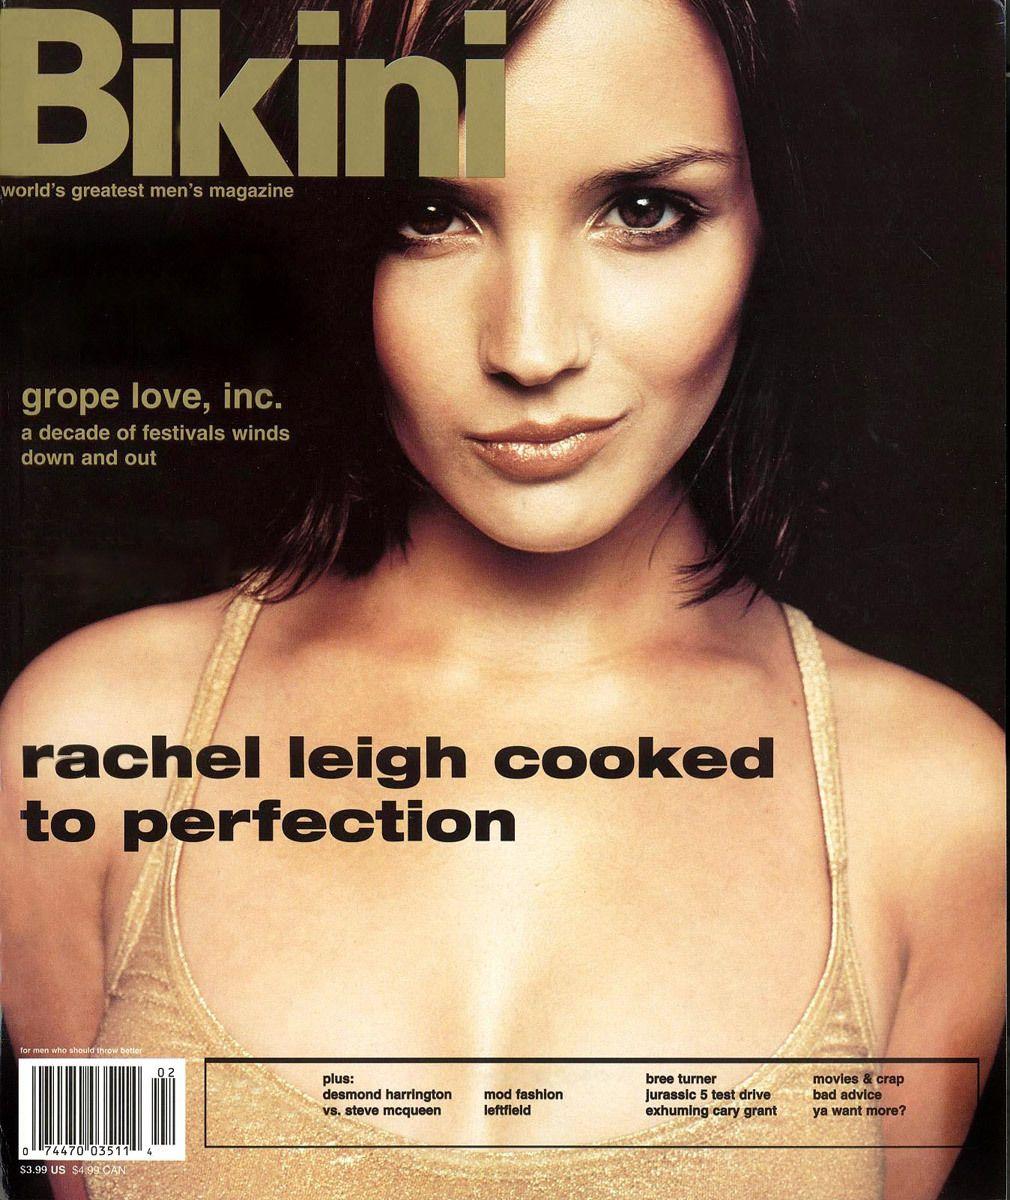 1r29_rachel_lee_cook_bikini.jpg